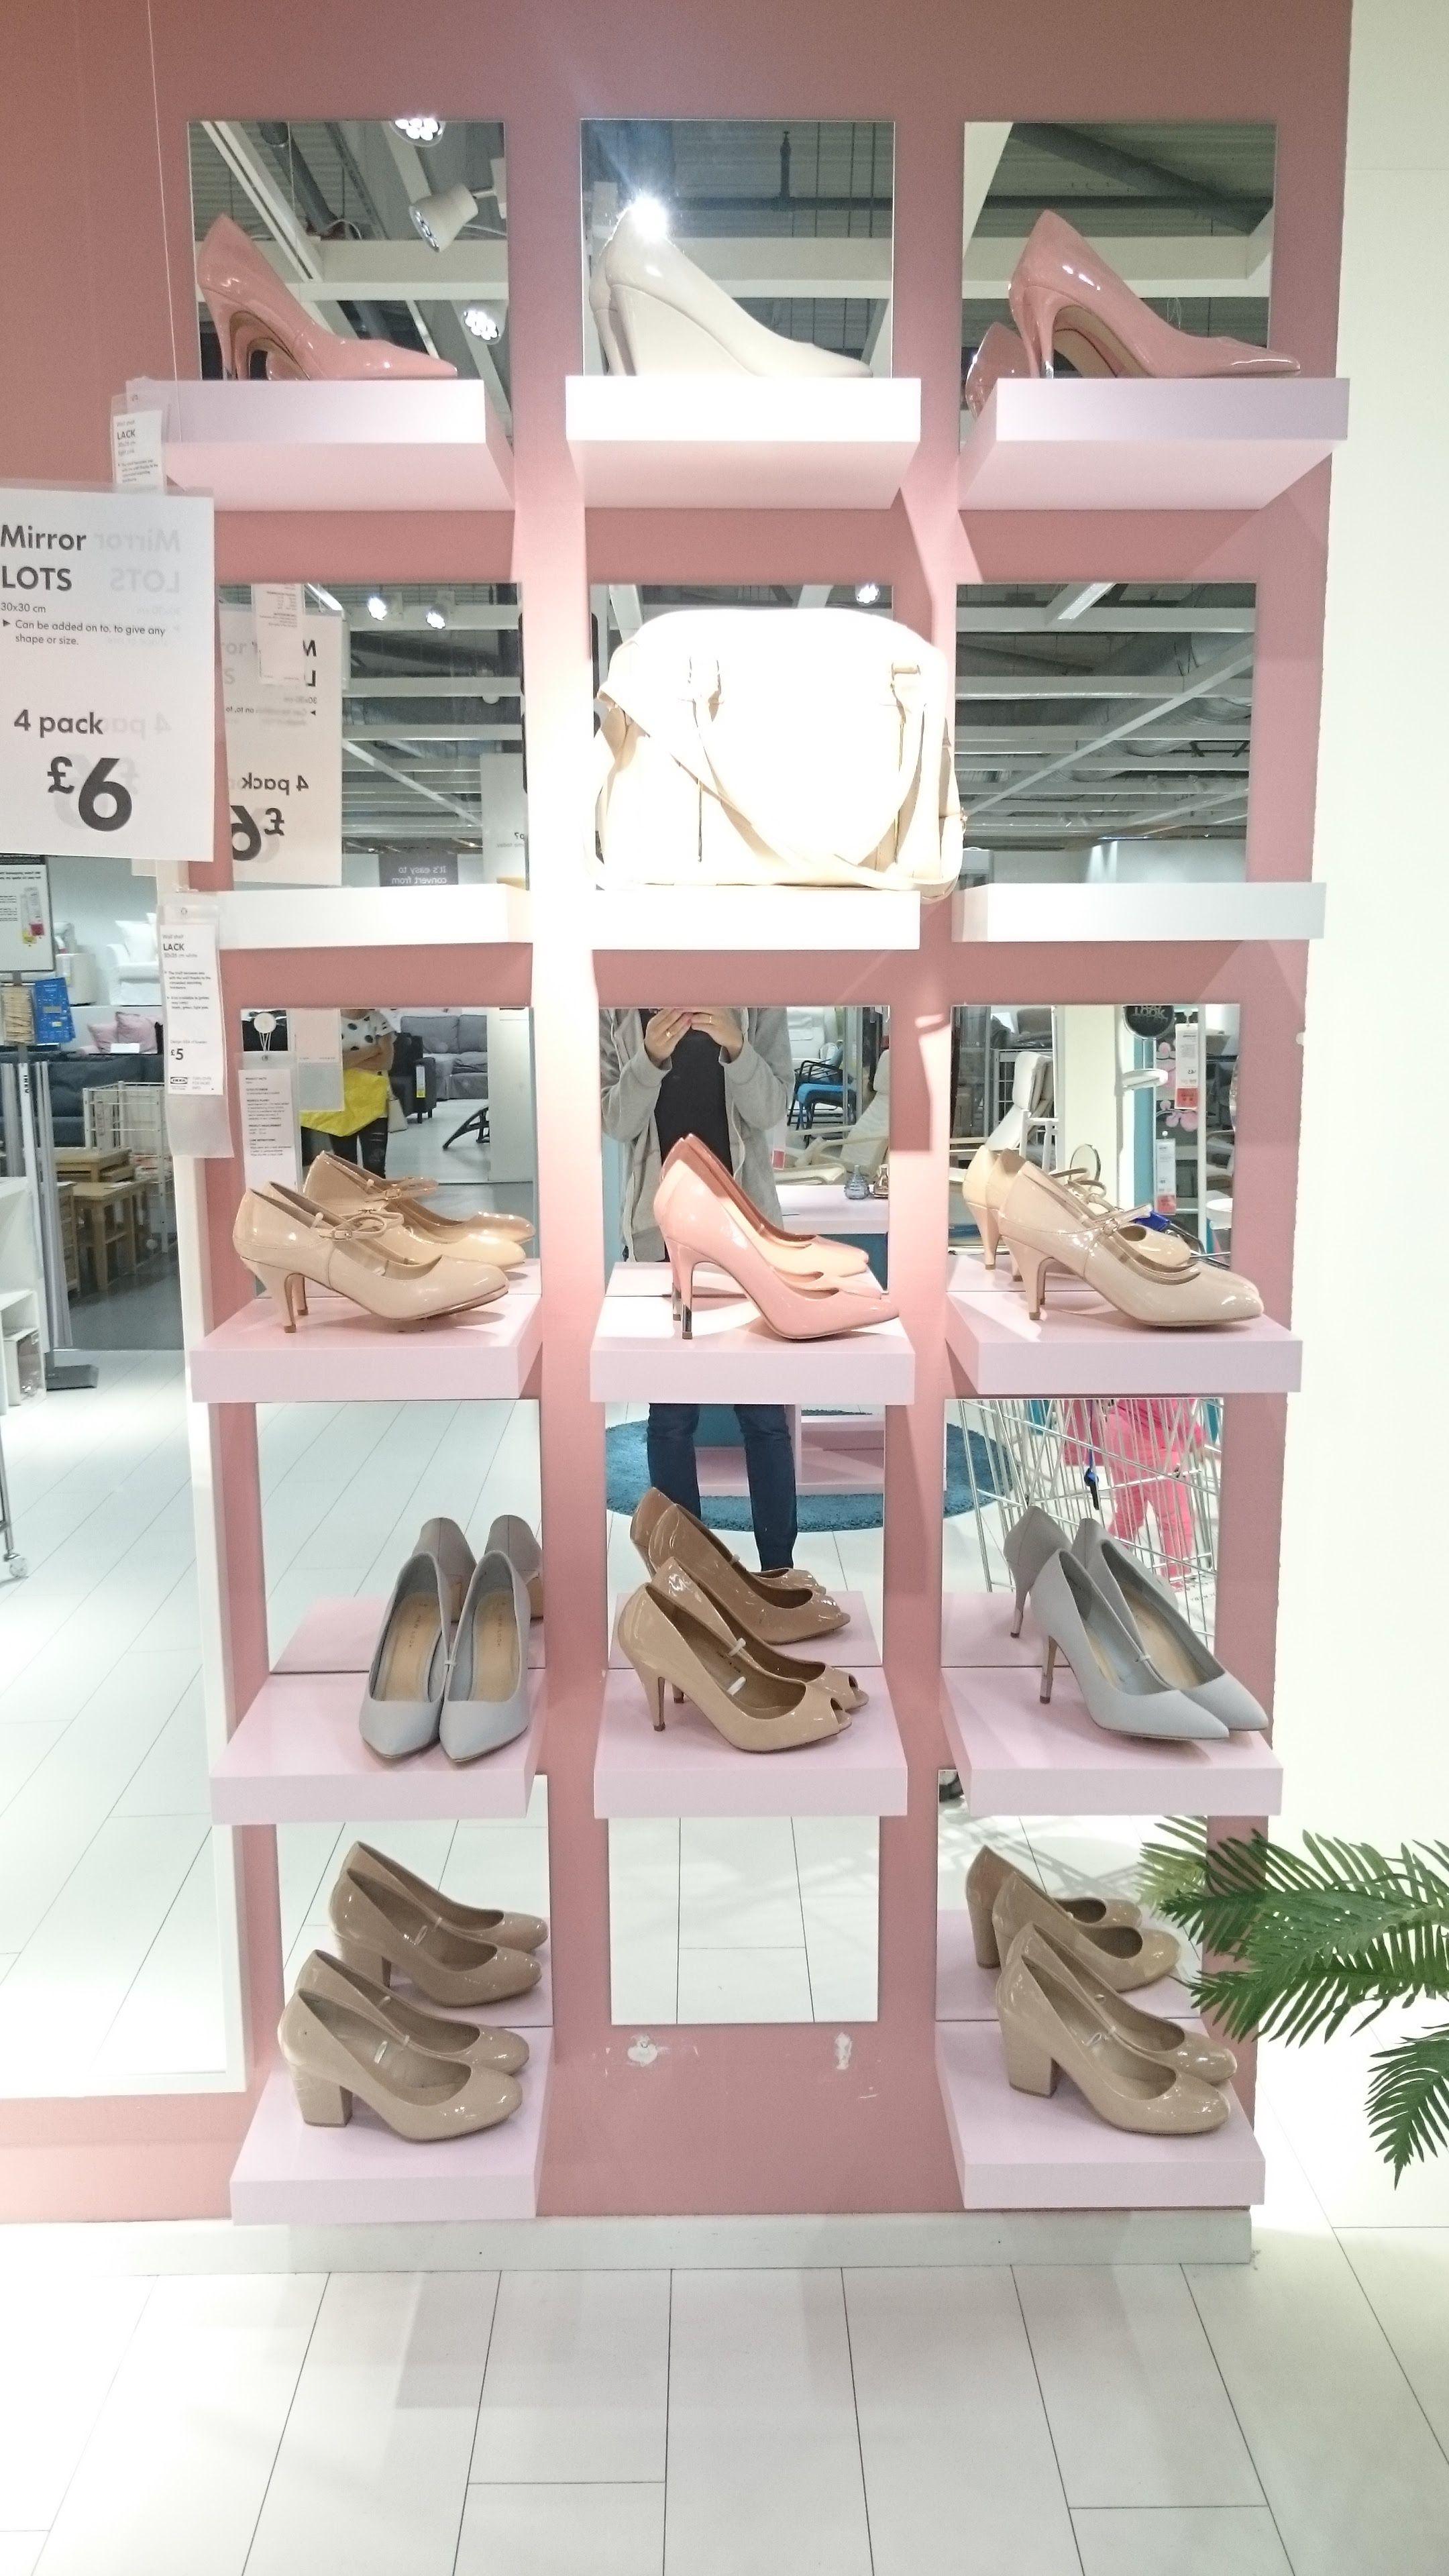 Ikea u0027Lacku0027 shelves and u0027Lotsu0027 mirrors for